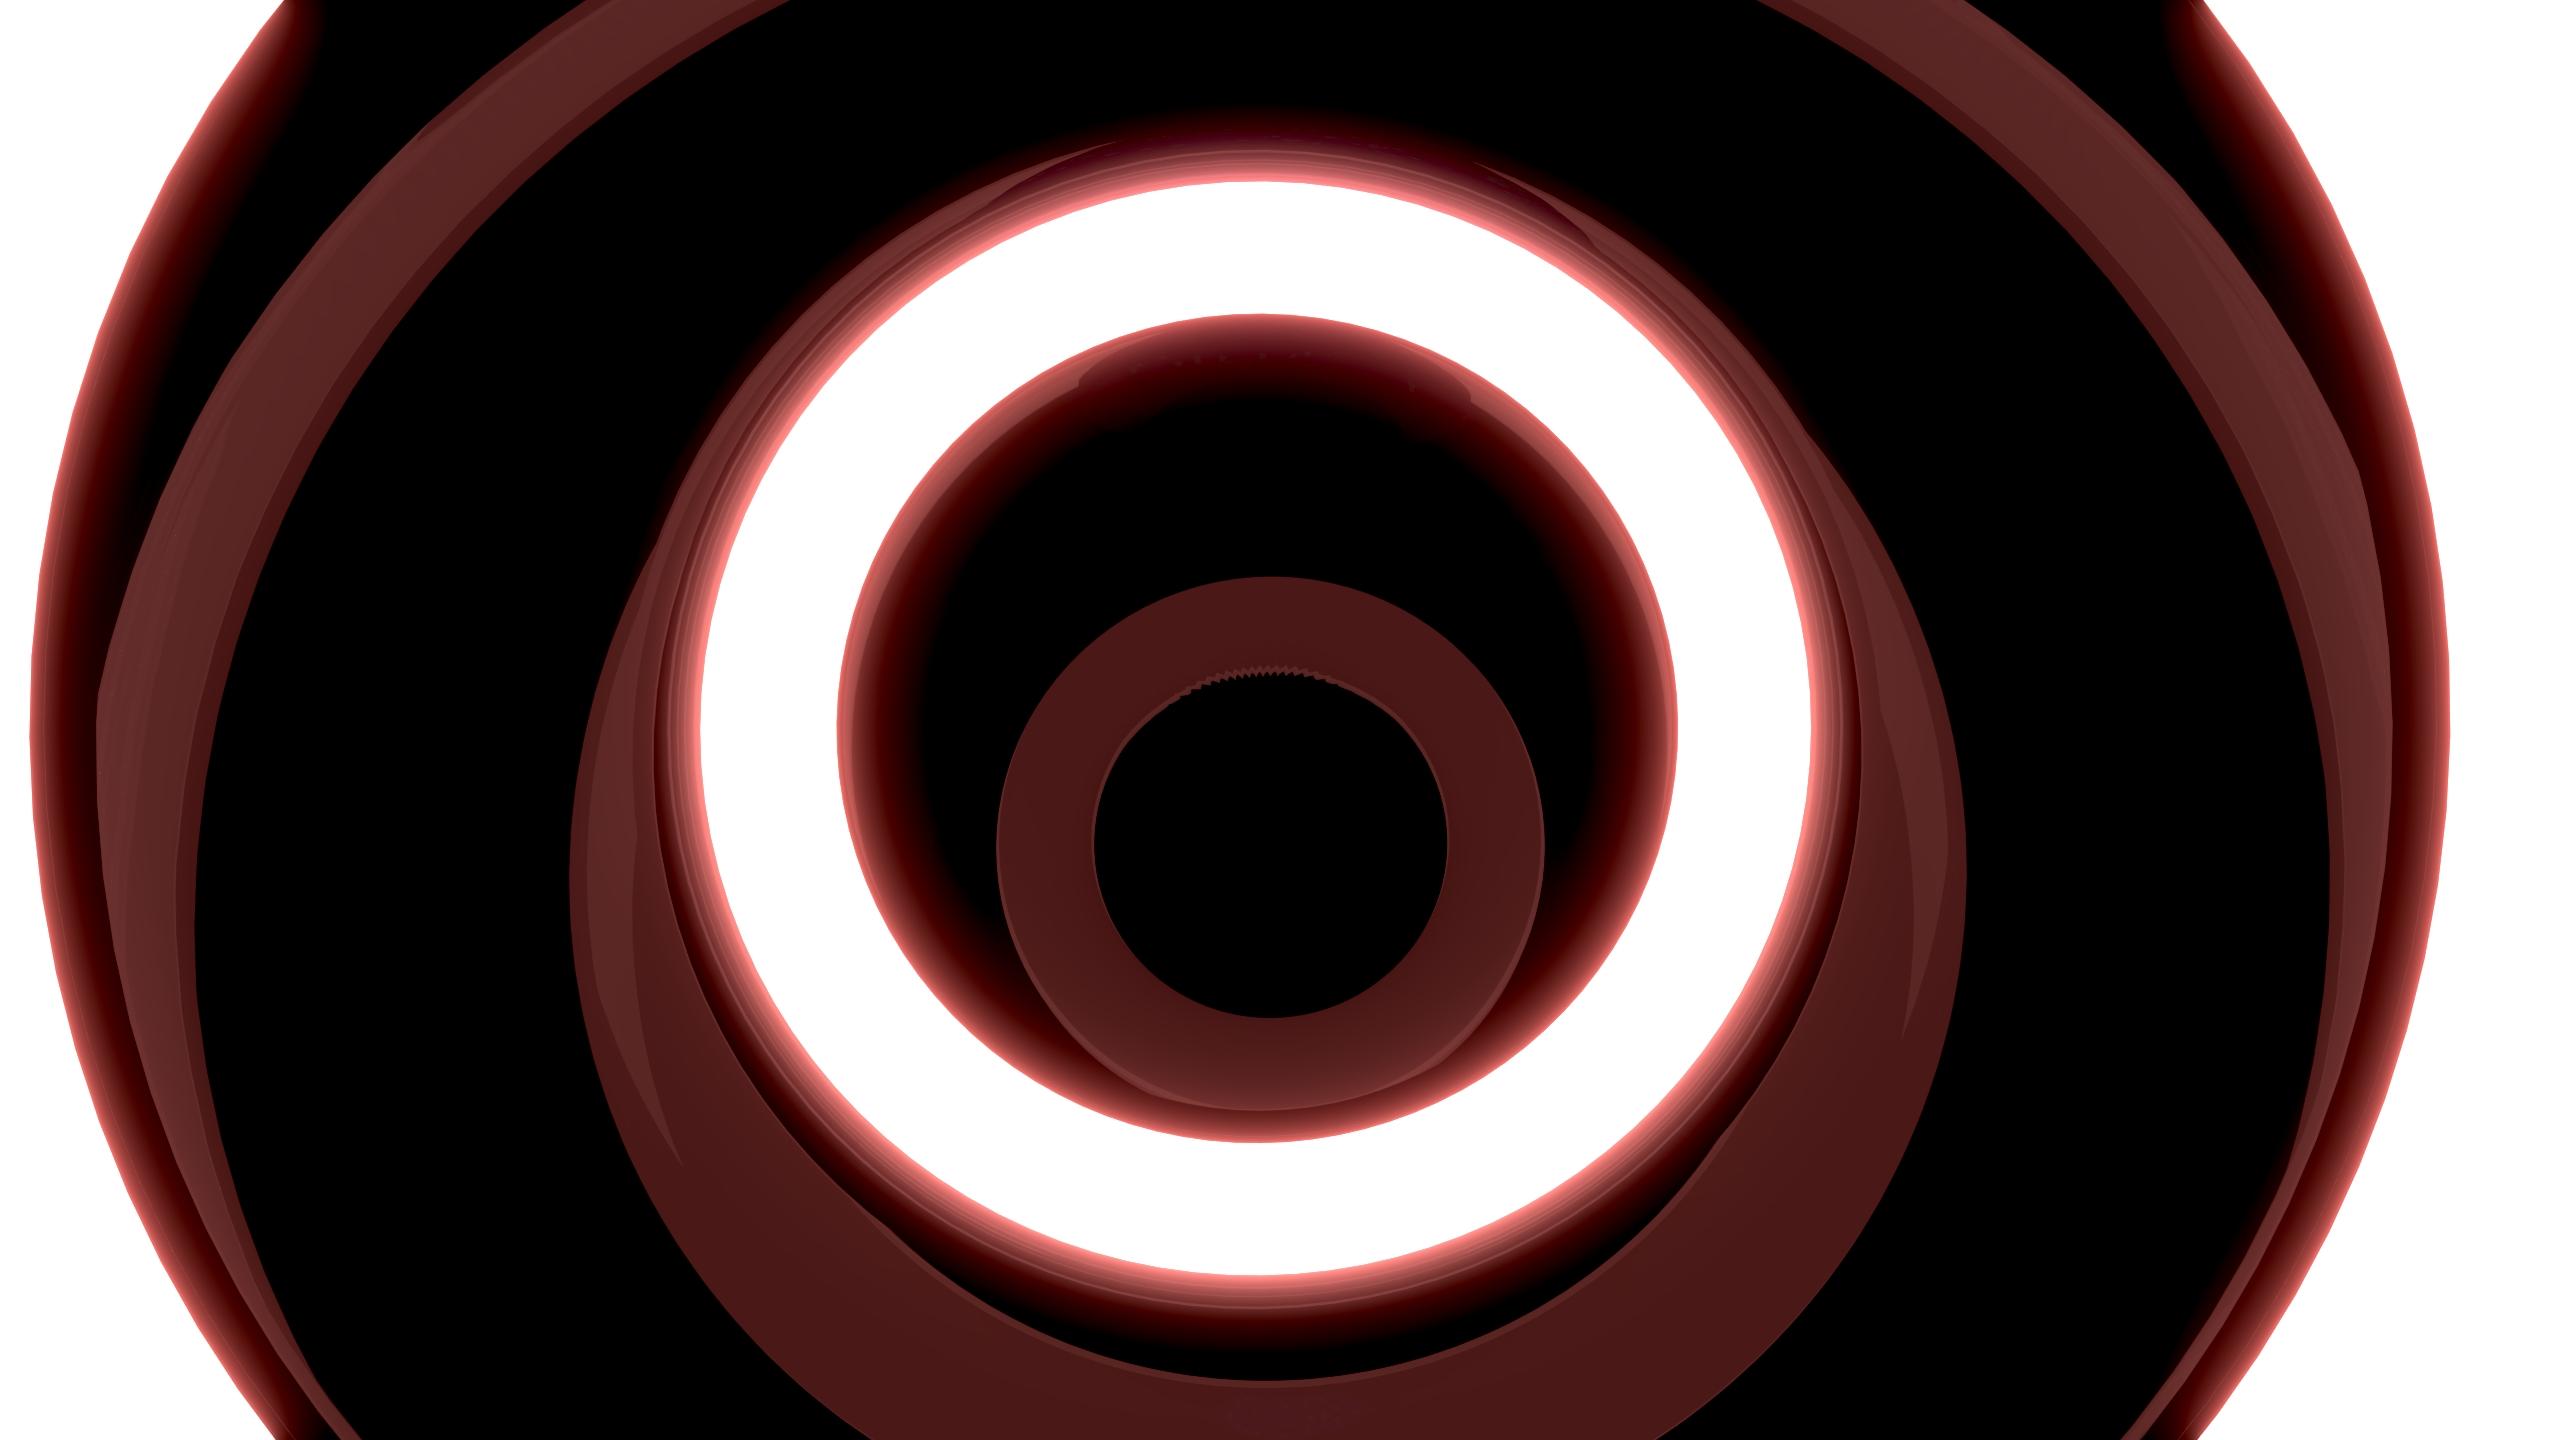 Red Rings Fond Décran Hd Arrière Plan 2560x1440 Id